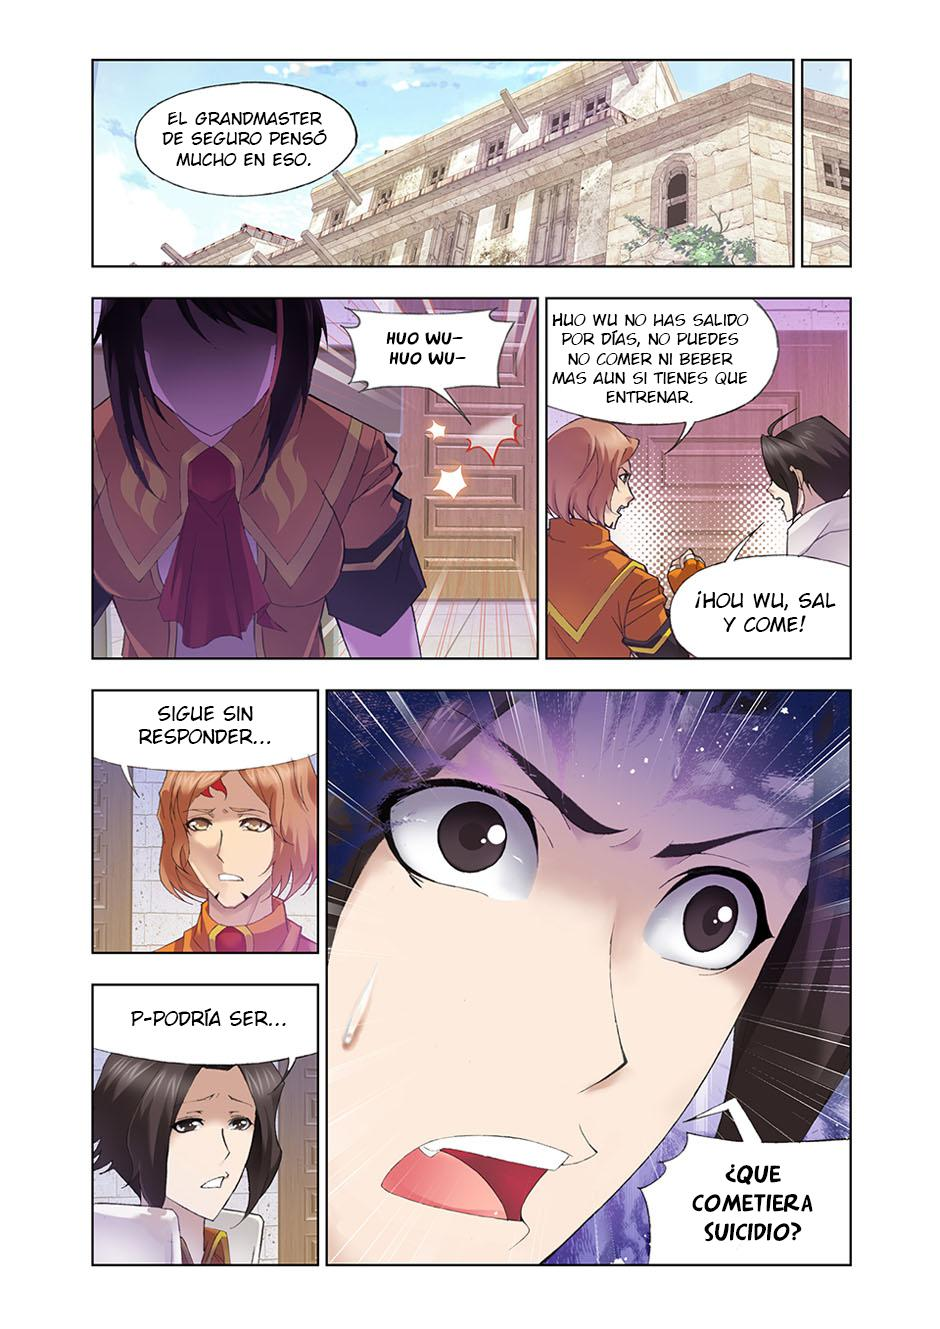 http://c5.ninemanga.com/es_manga/18/16210/417363/eaaa16cb30631f14929efbbed738f19d.jpg Page 6